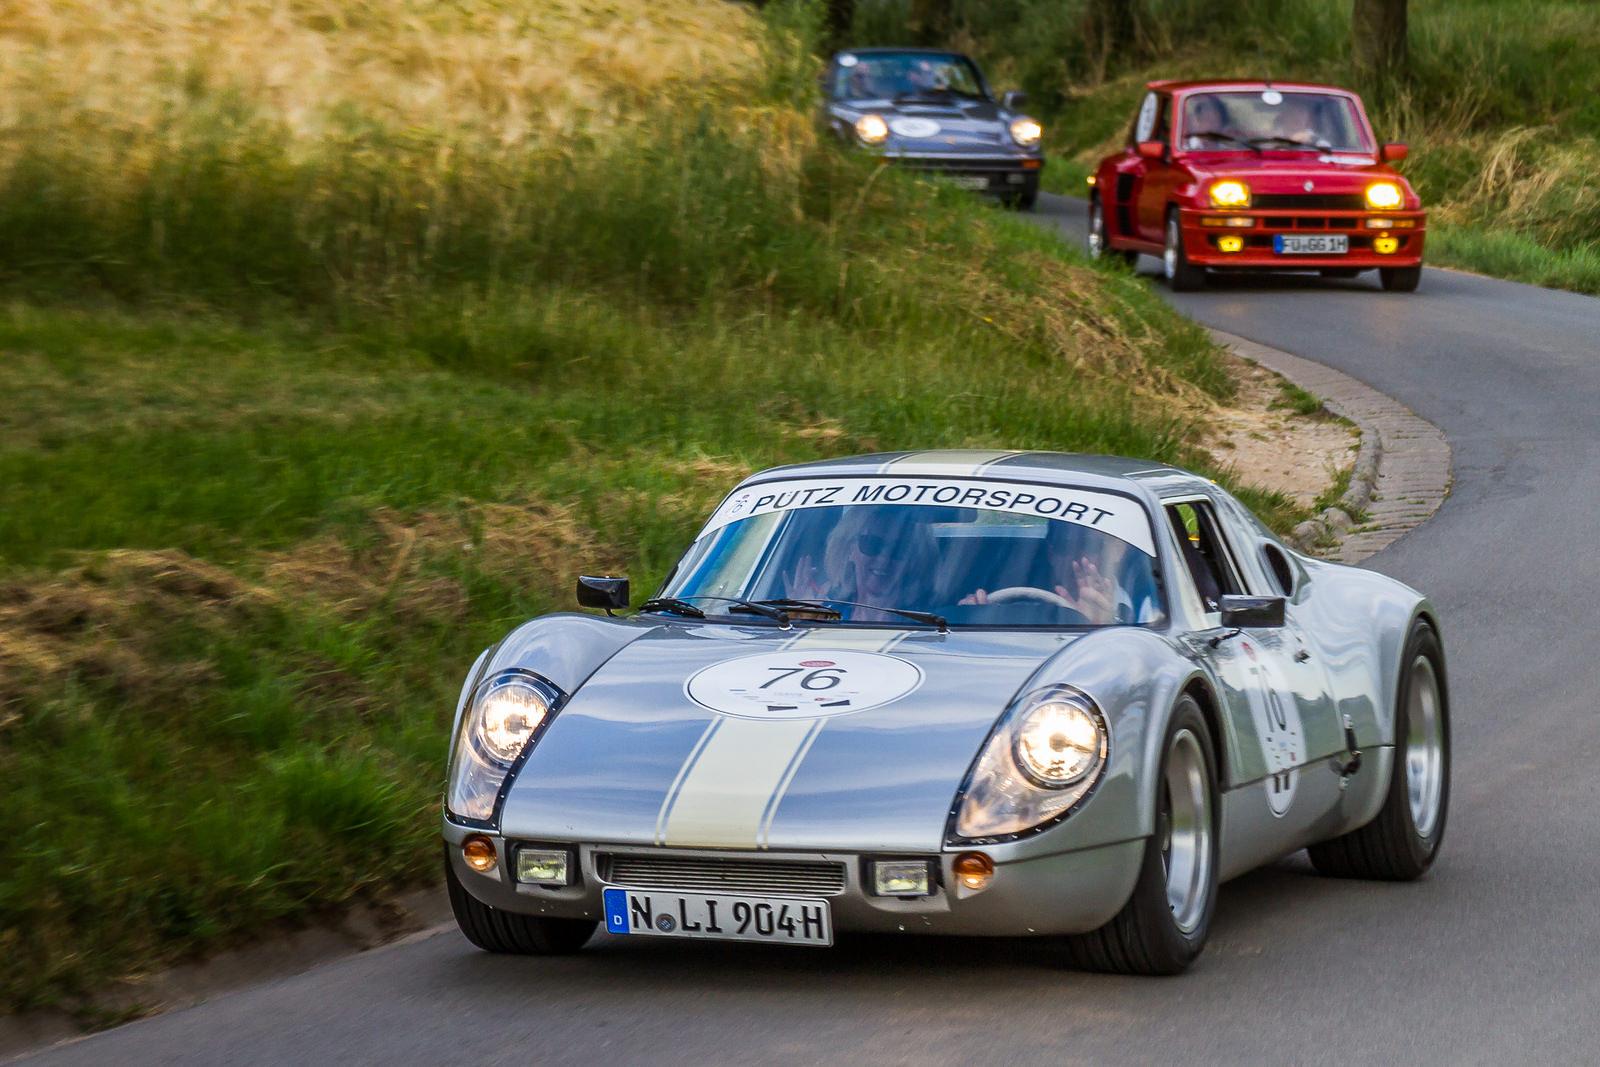 Altmühltal Classic Sprint 11